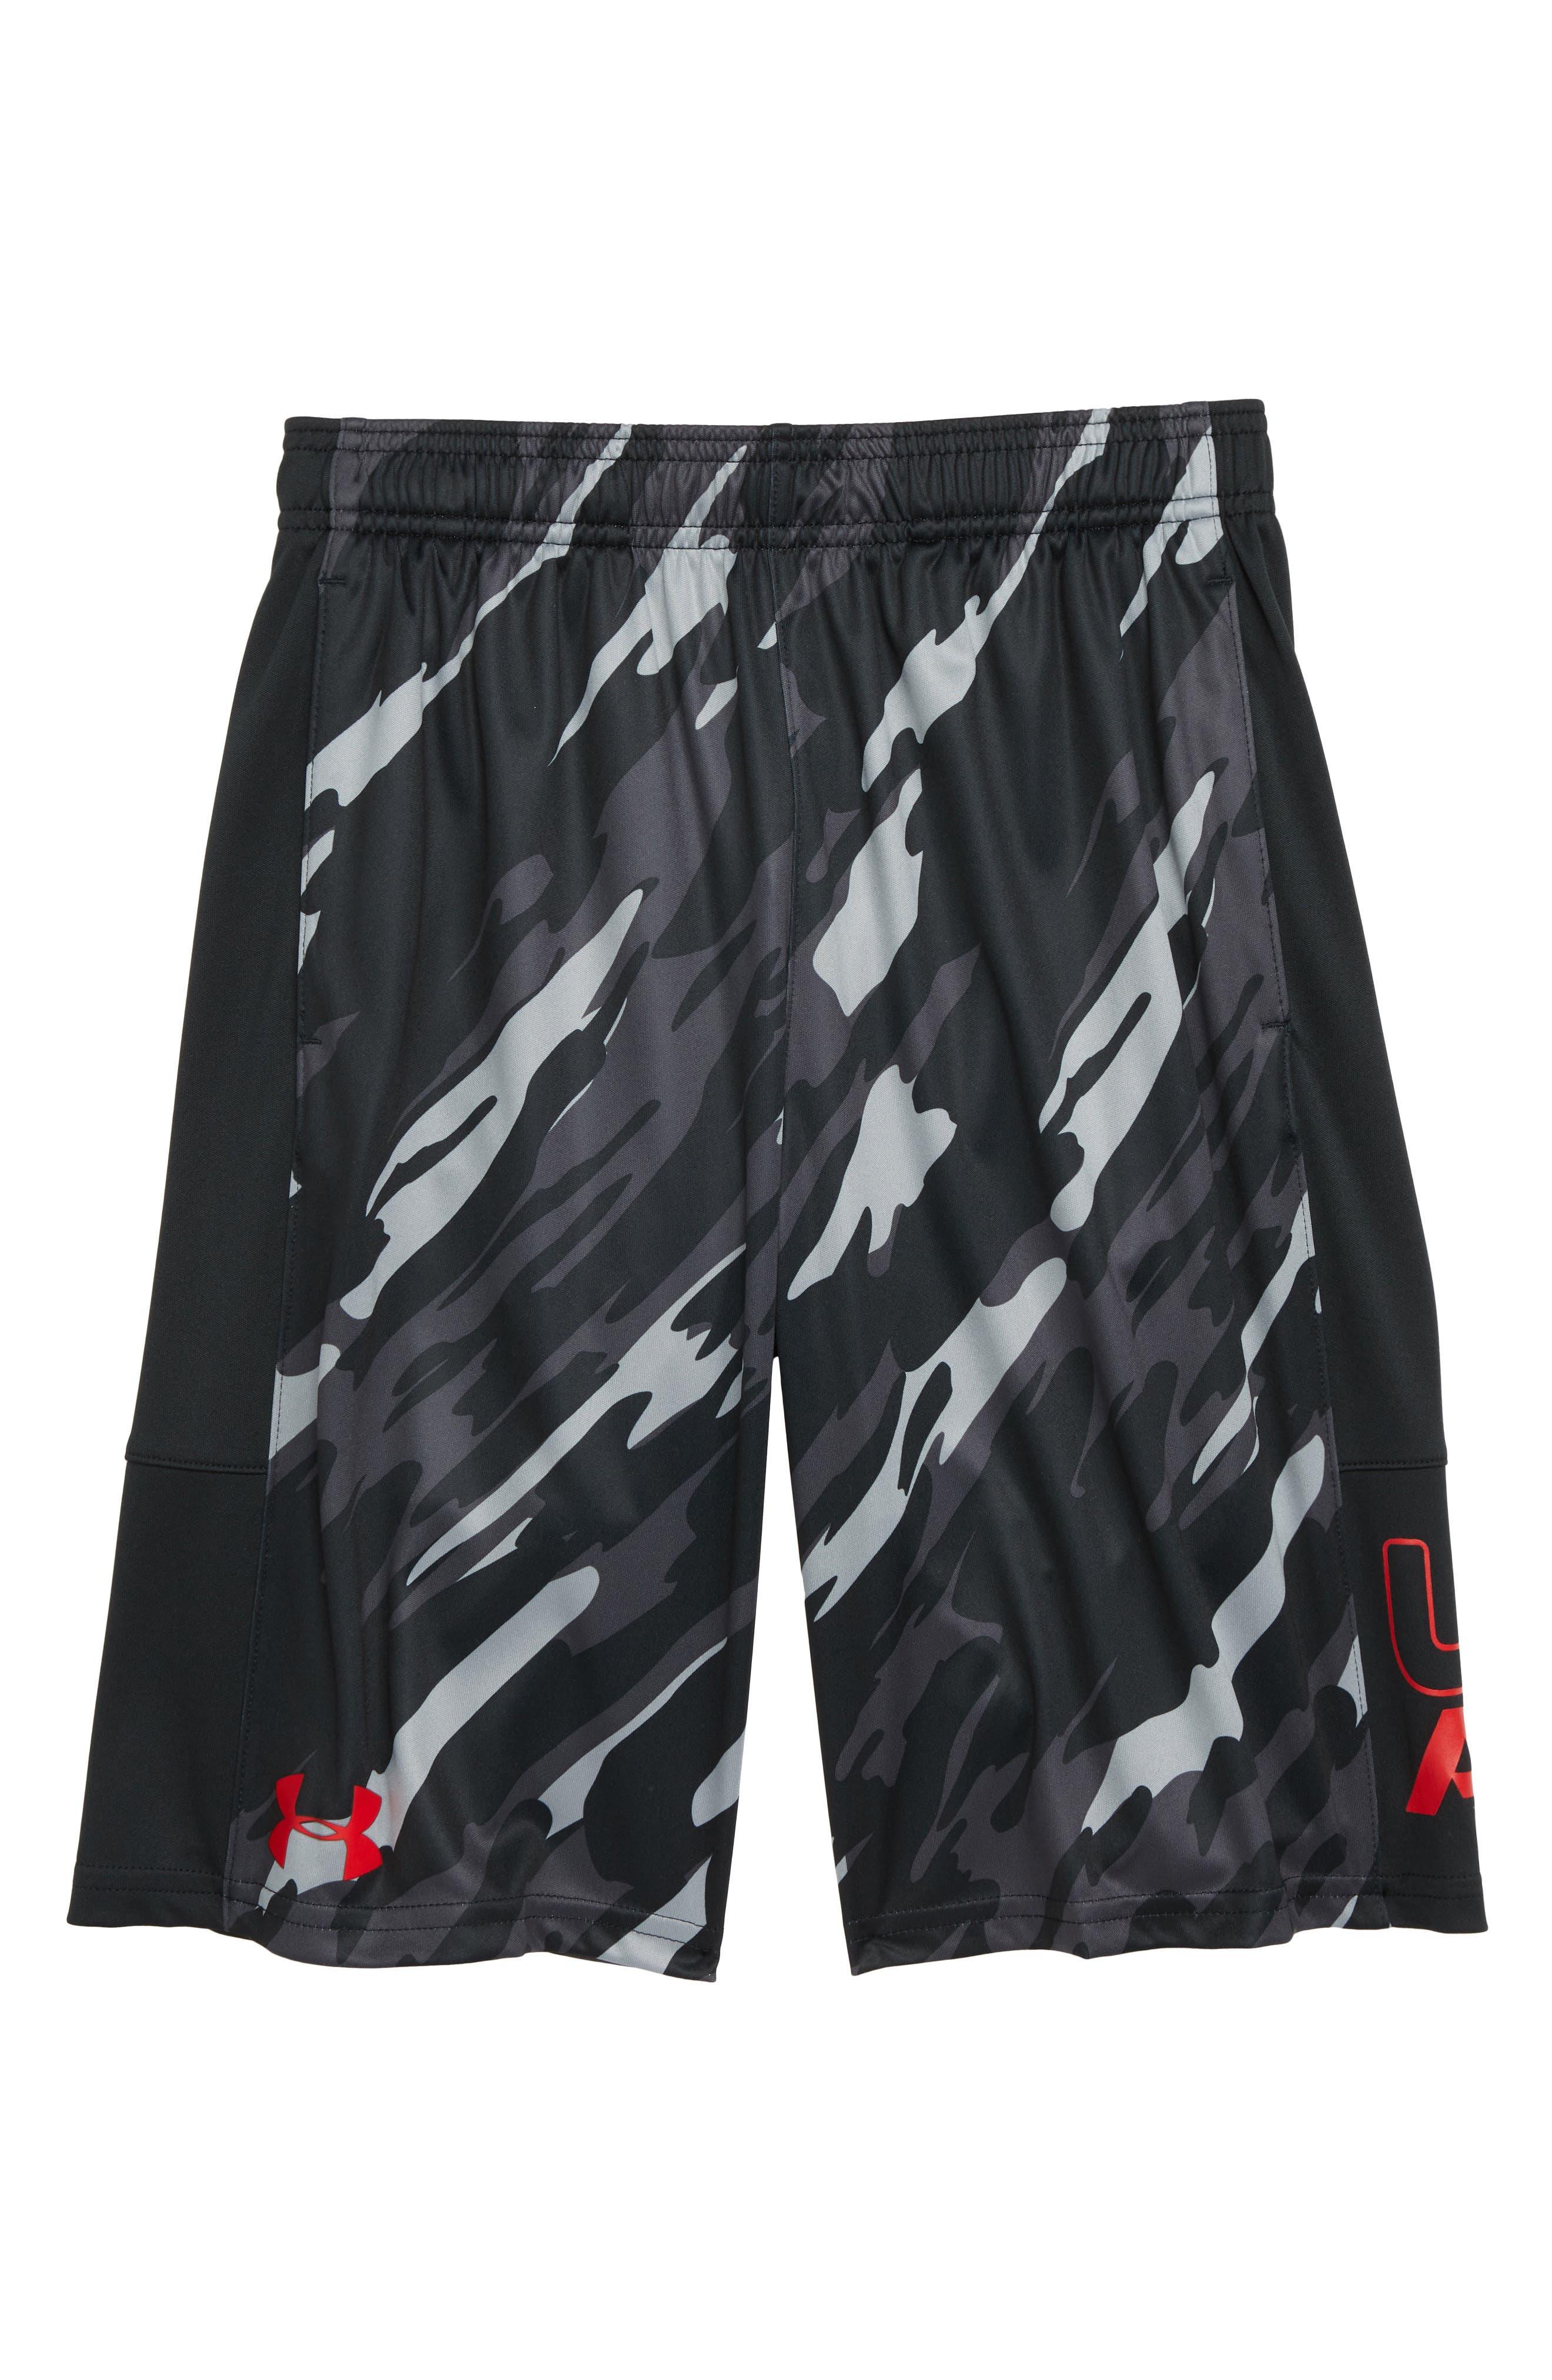 Stunt HeatGear<sup>®</sup> Shorts,                             Main thumbnail 1, color,                             BLACK/RED